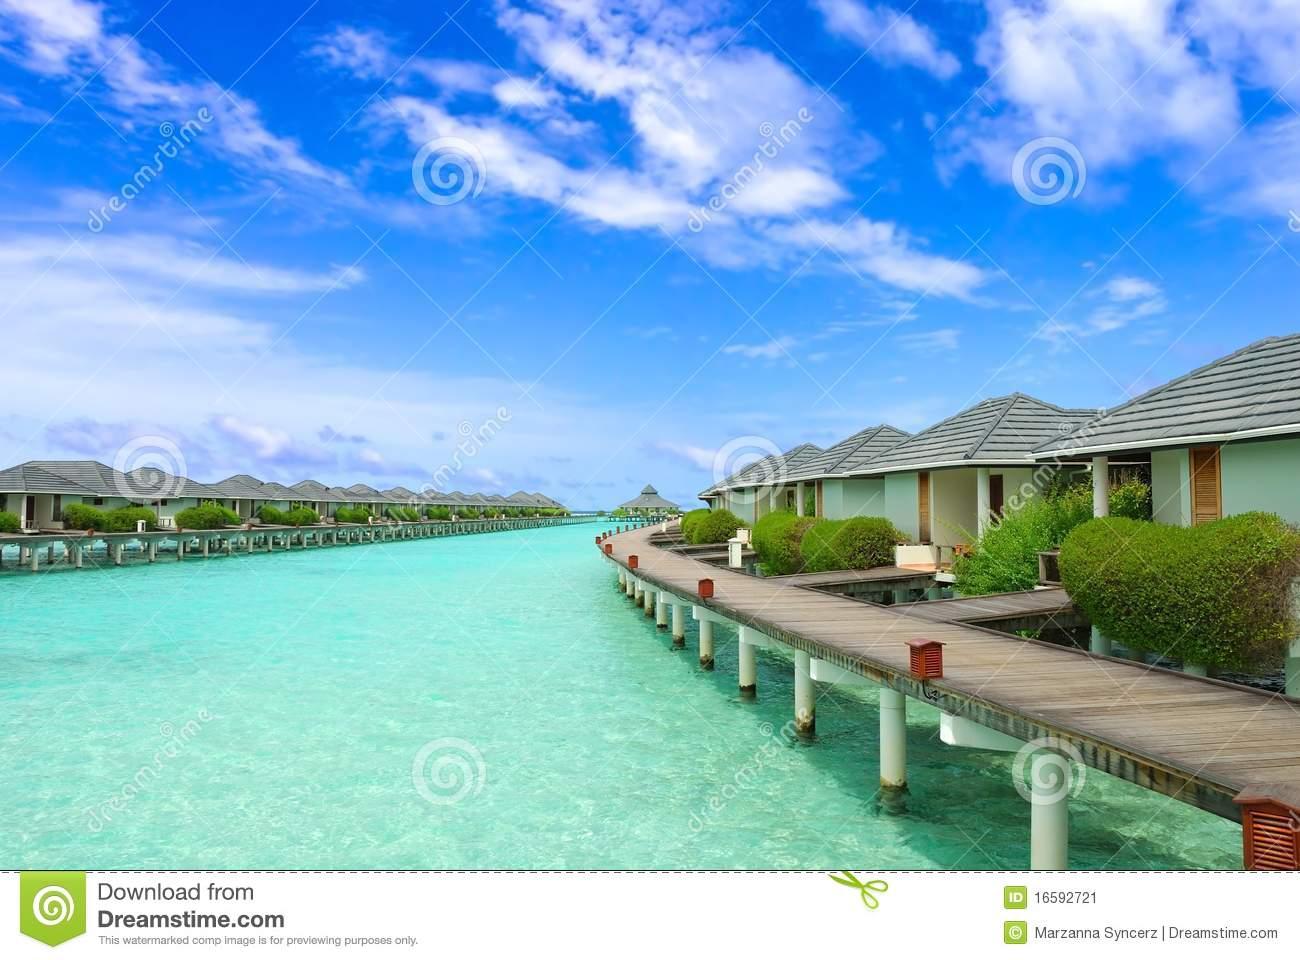 Maldives Seaside Resort Stock Image.